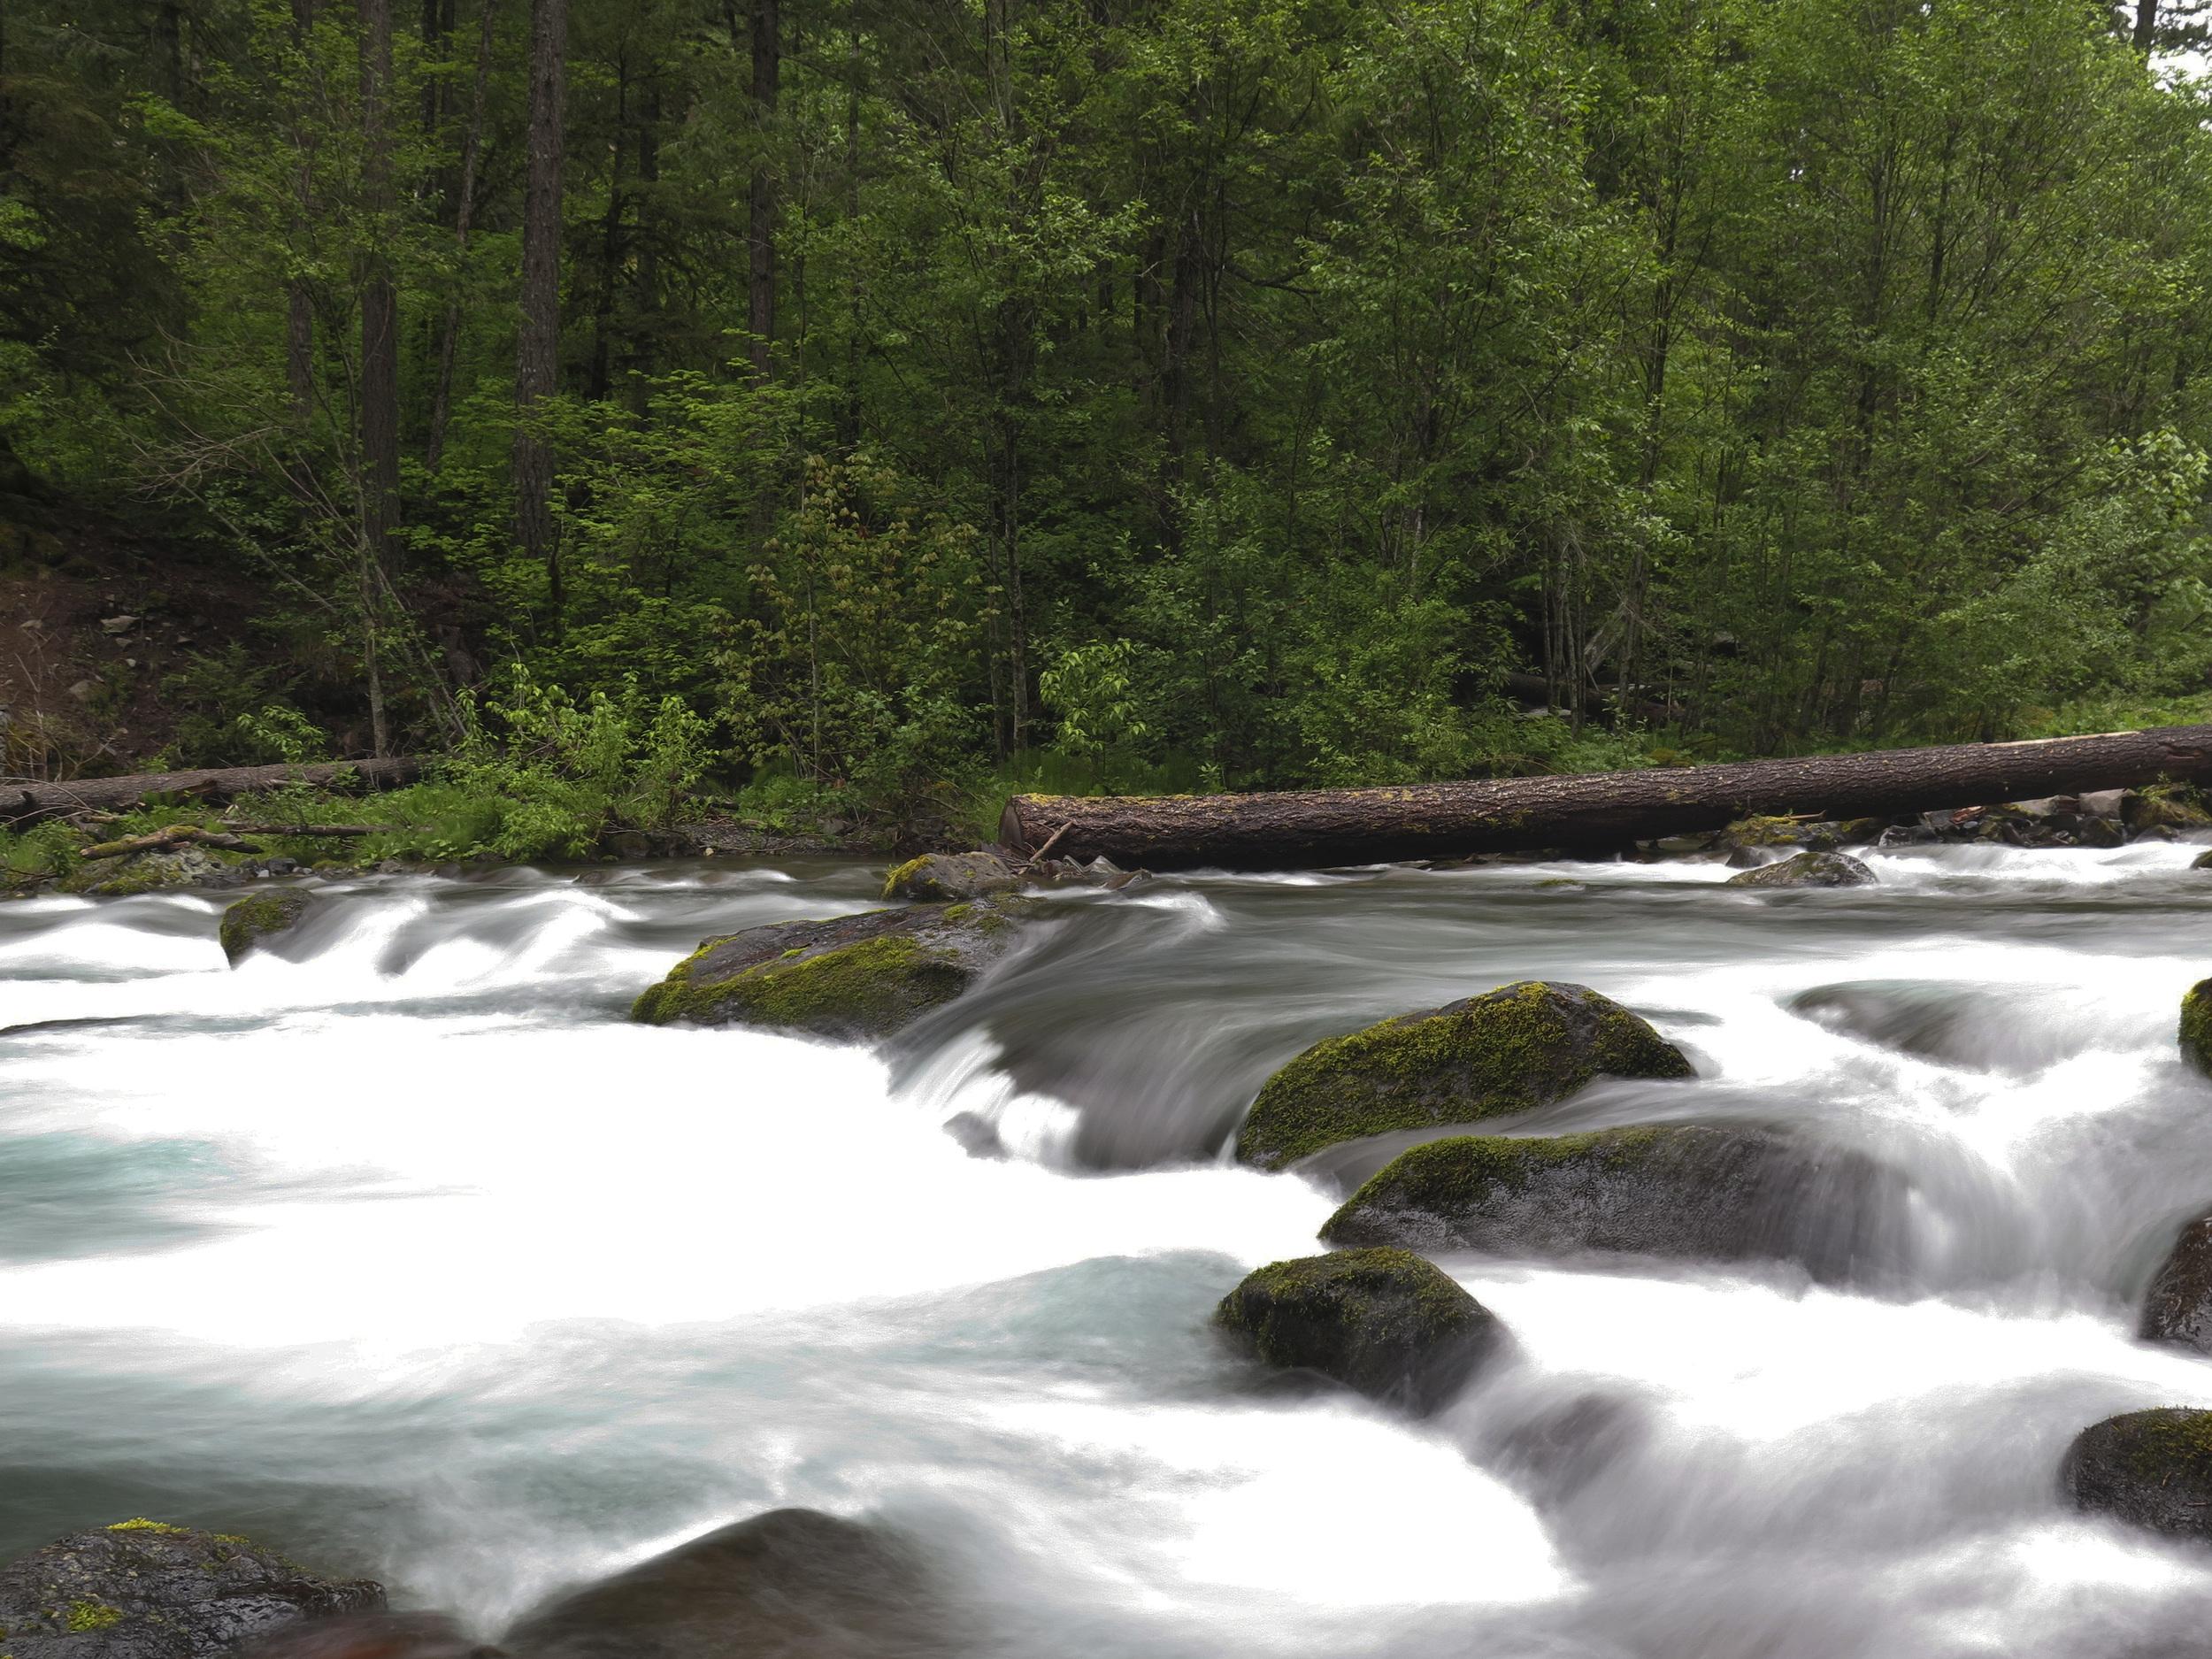 Umpqua River, Oregon